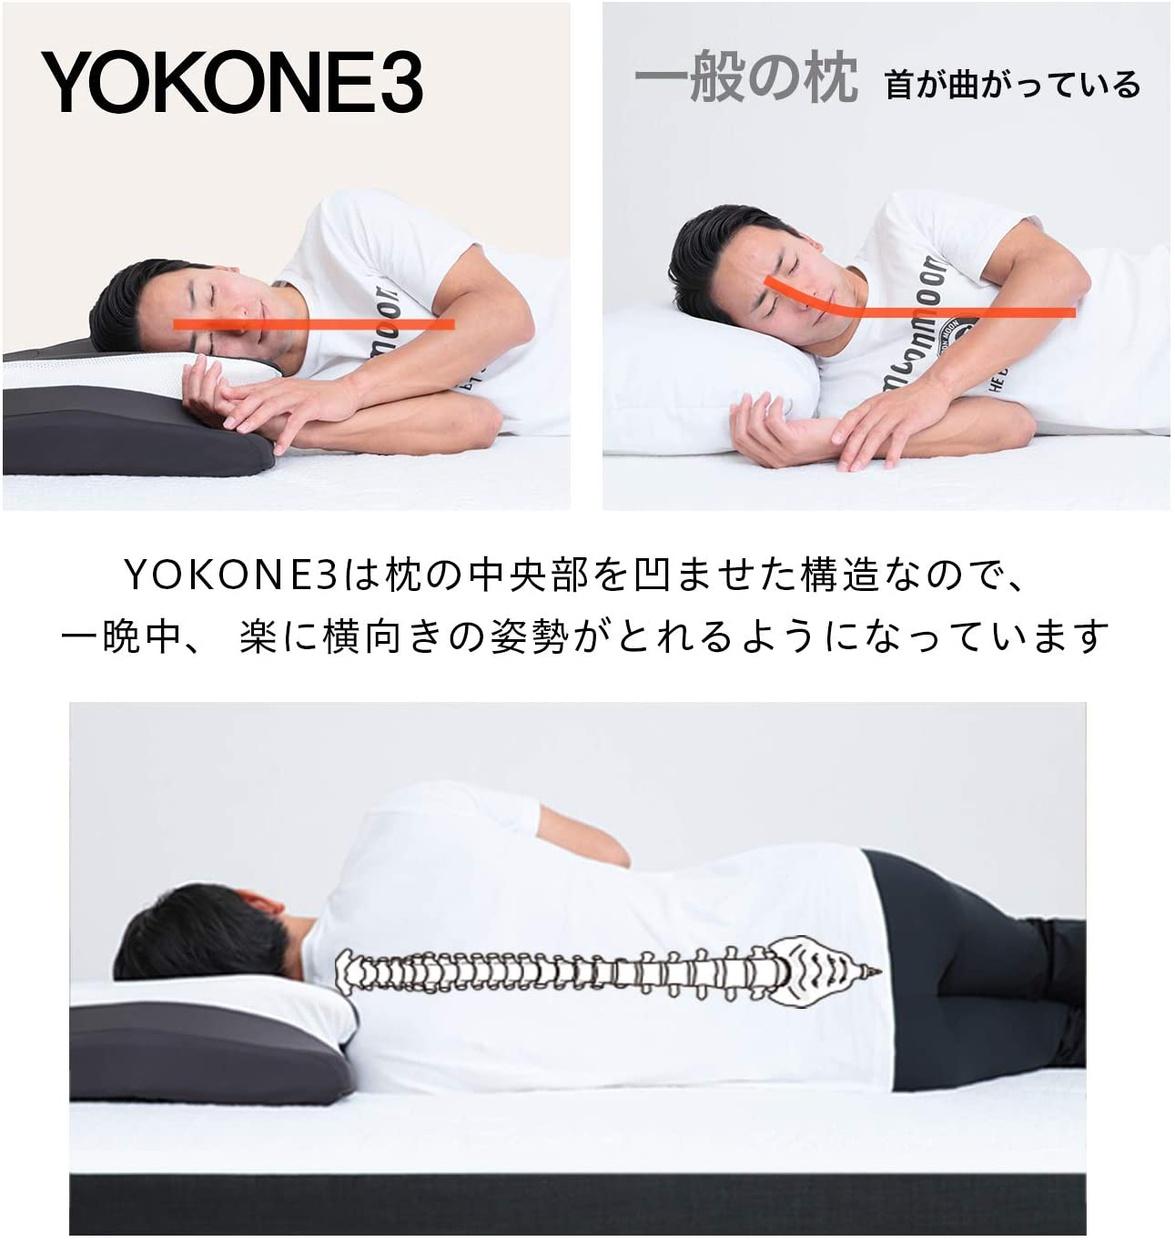 Moonmoon(ムーンムーン) YOKONE3の商品画像5